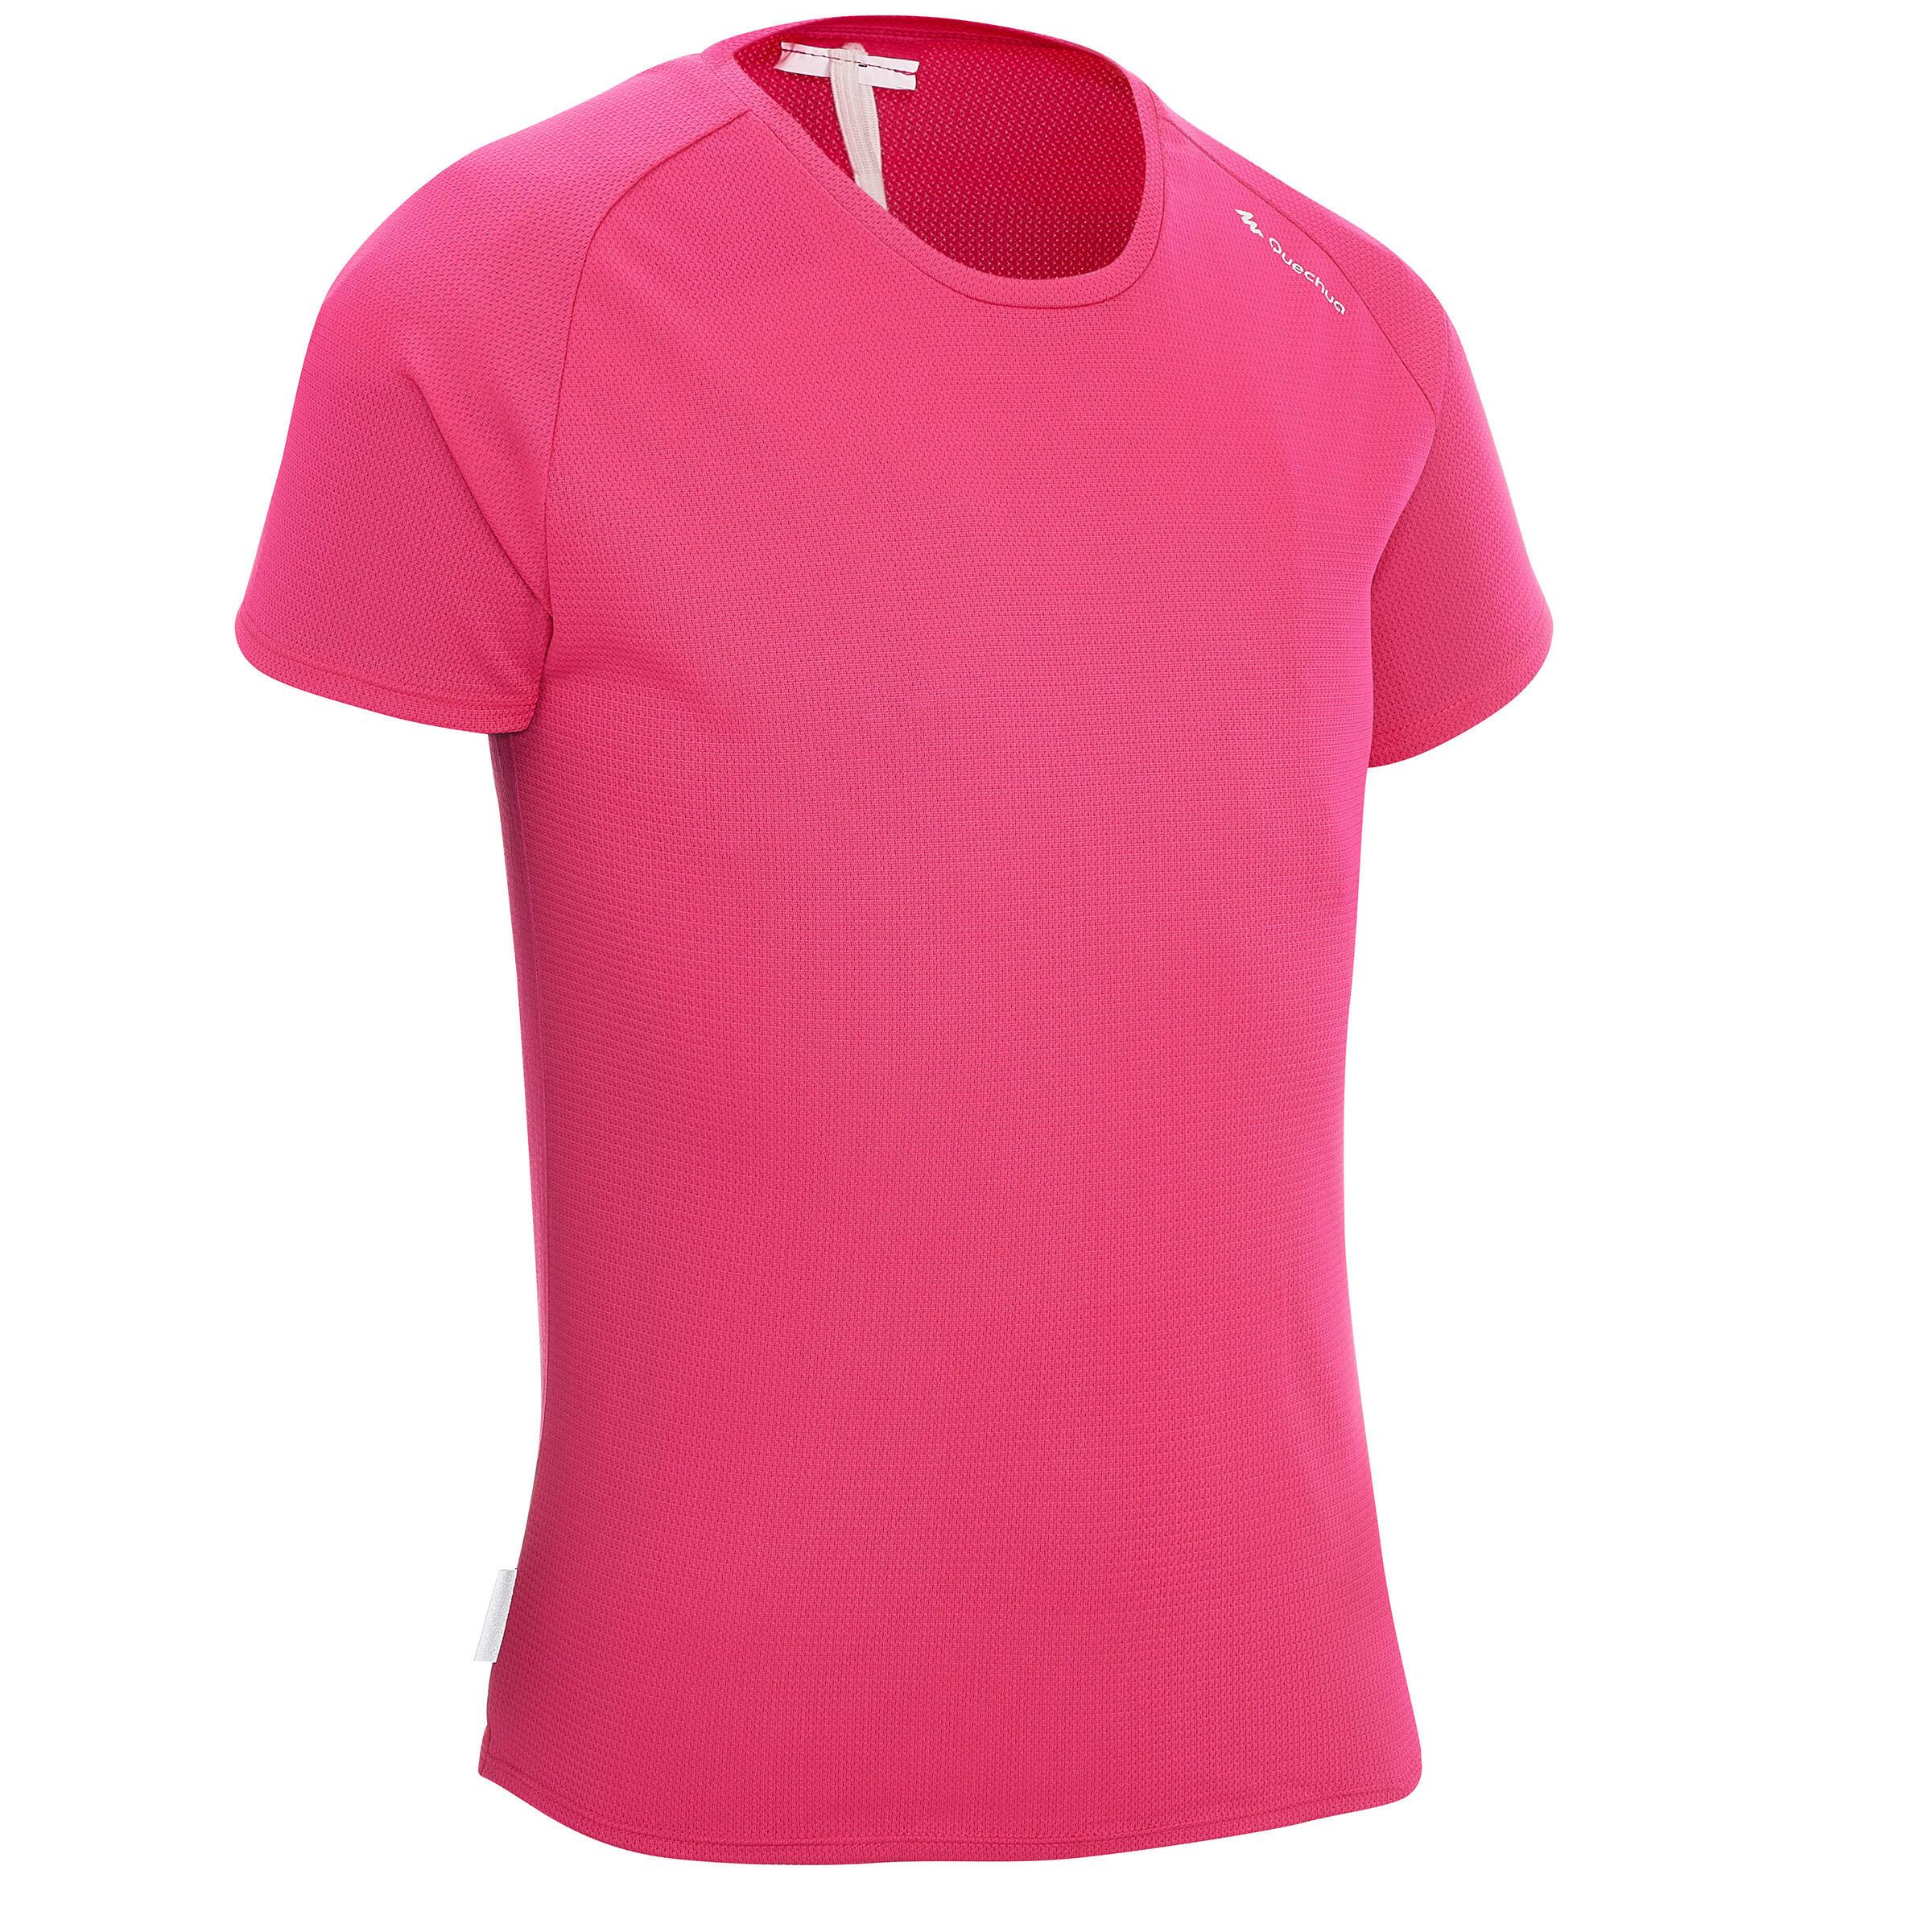 Camiseta de senderismo niña Hike 100 rosa